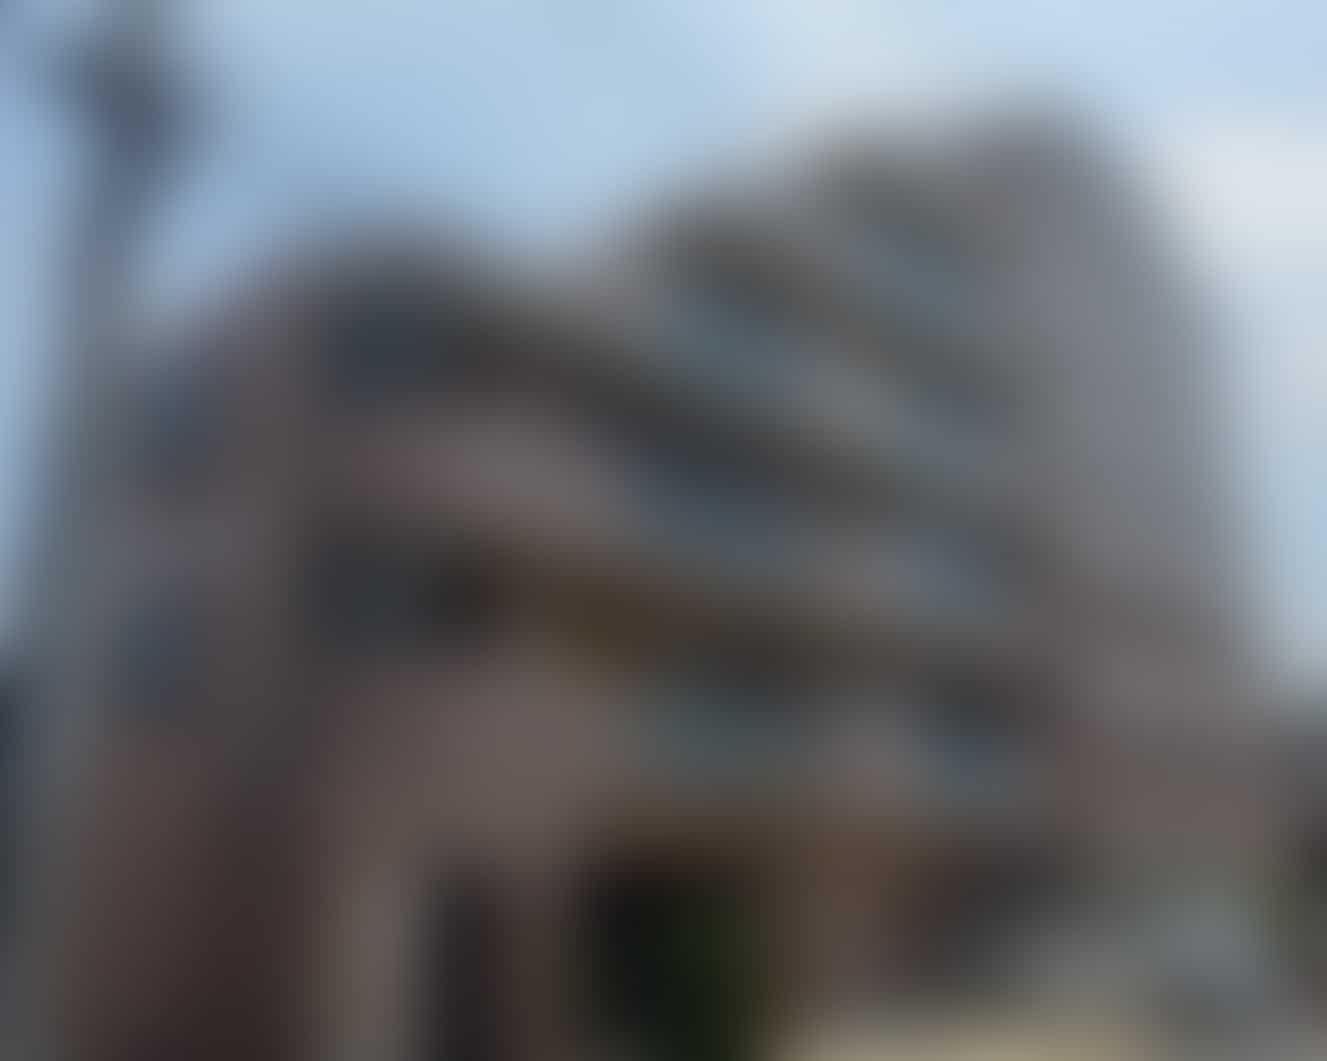 大阪府摂津市の解決事例写真